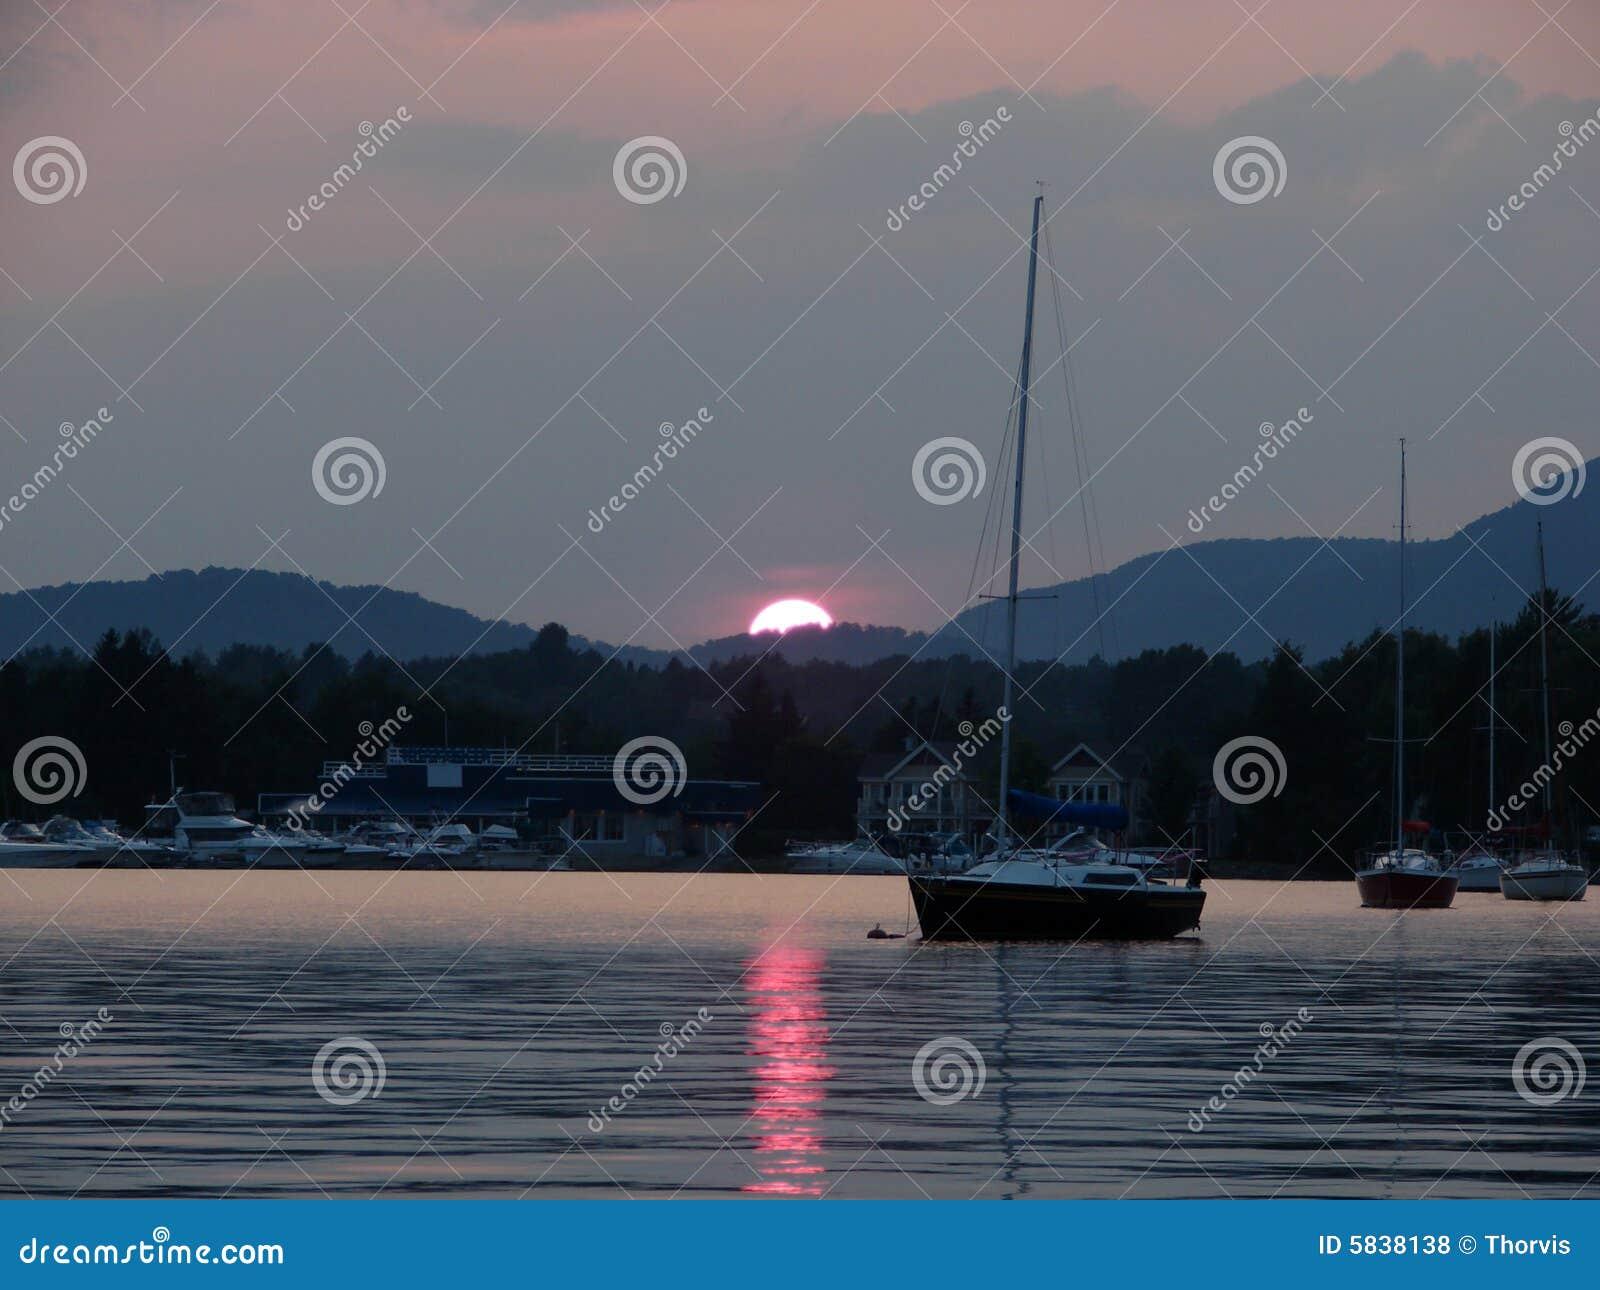 Memphremagog Lake at sunset